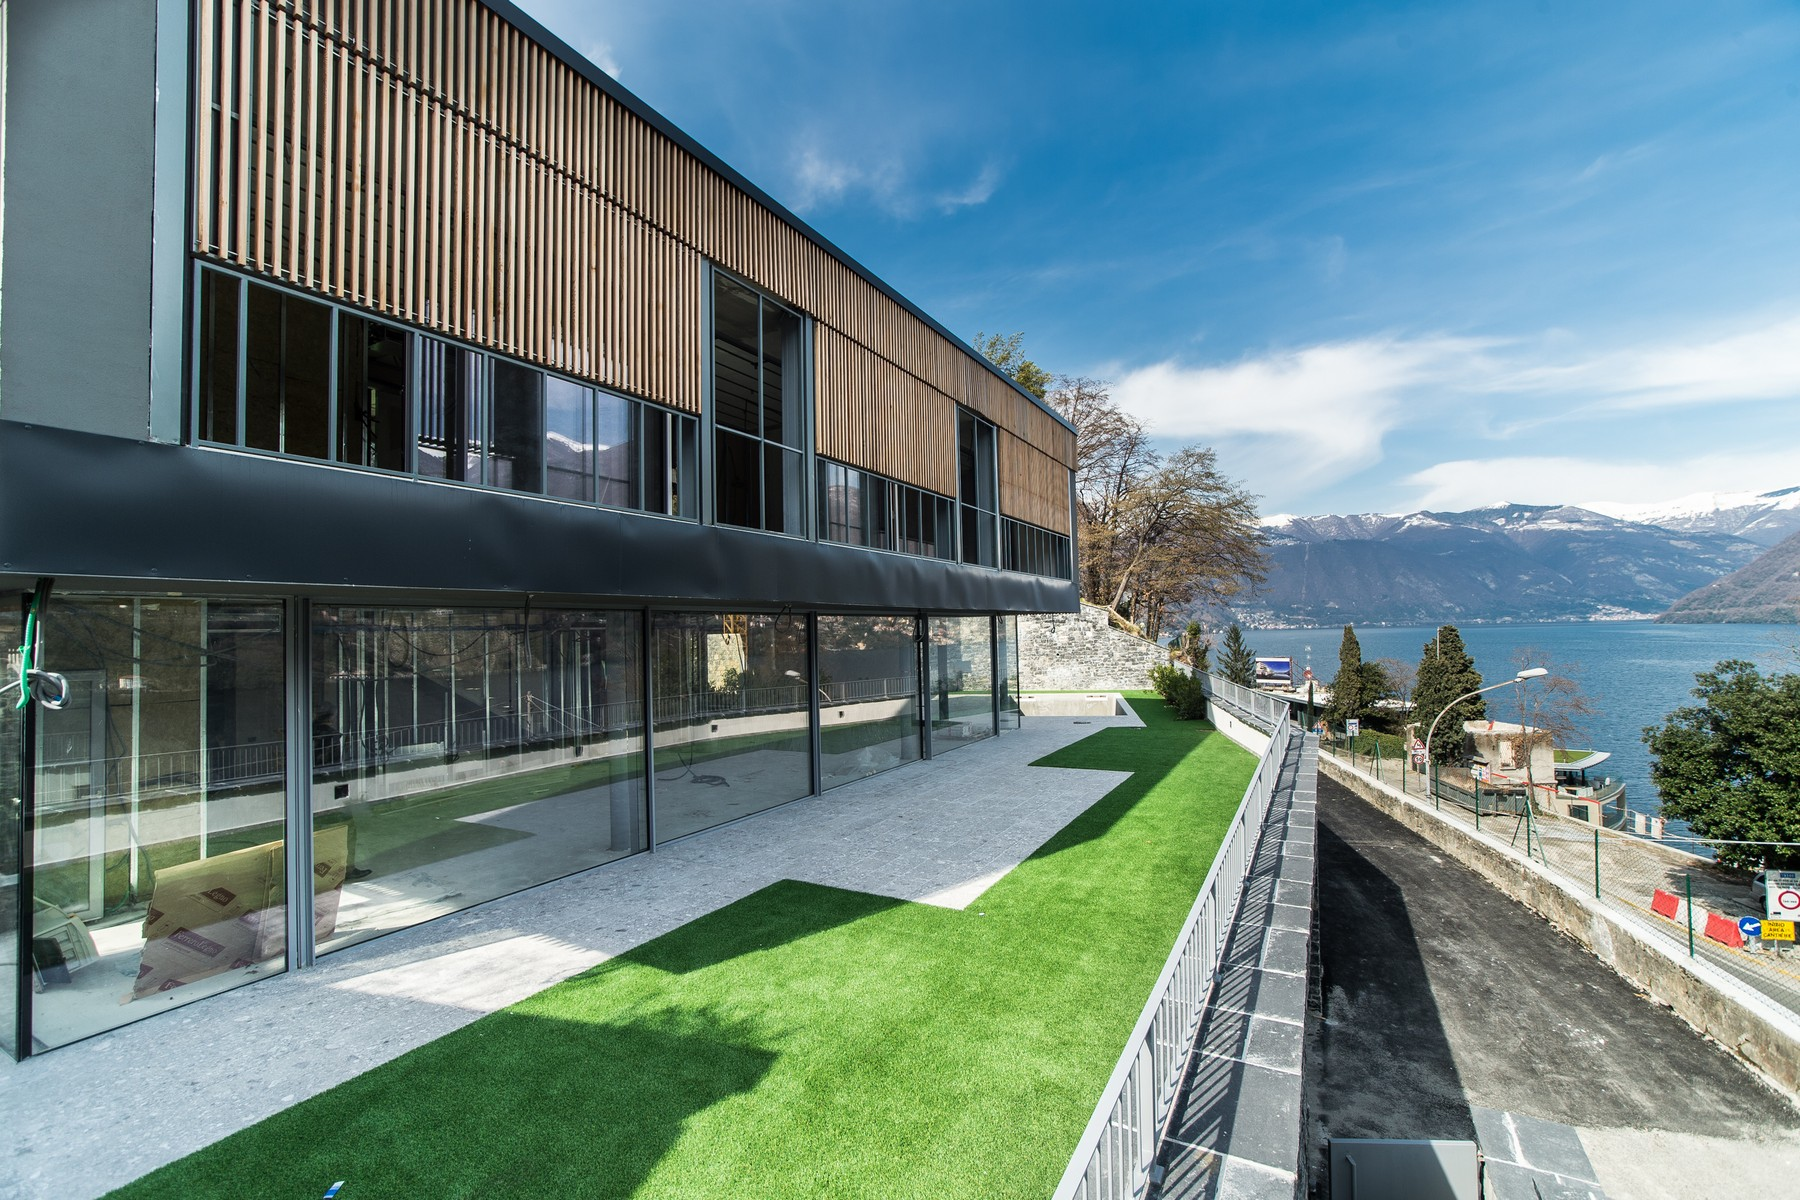 Einfamilienhaus für Verkauf beim Prestigious modern villa with private swimming pool and magnificent Lake views Laglio Laglio, Como 22010 Italien